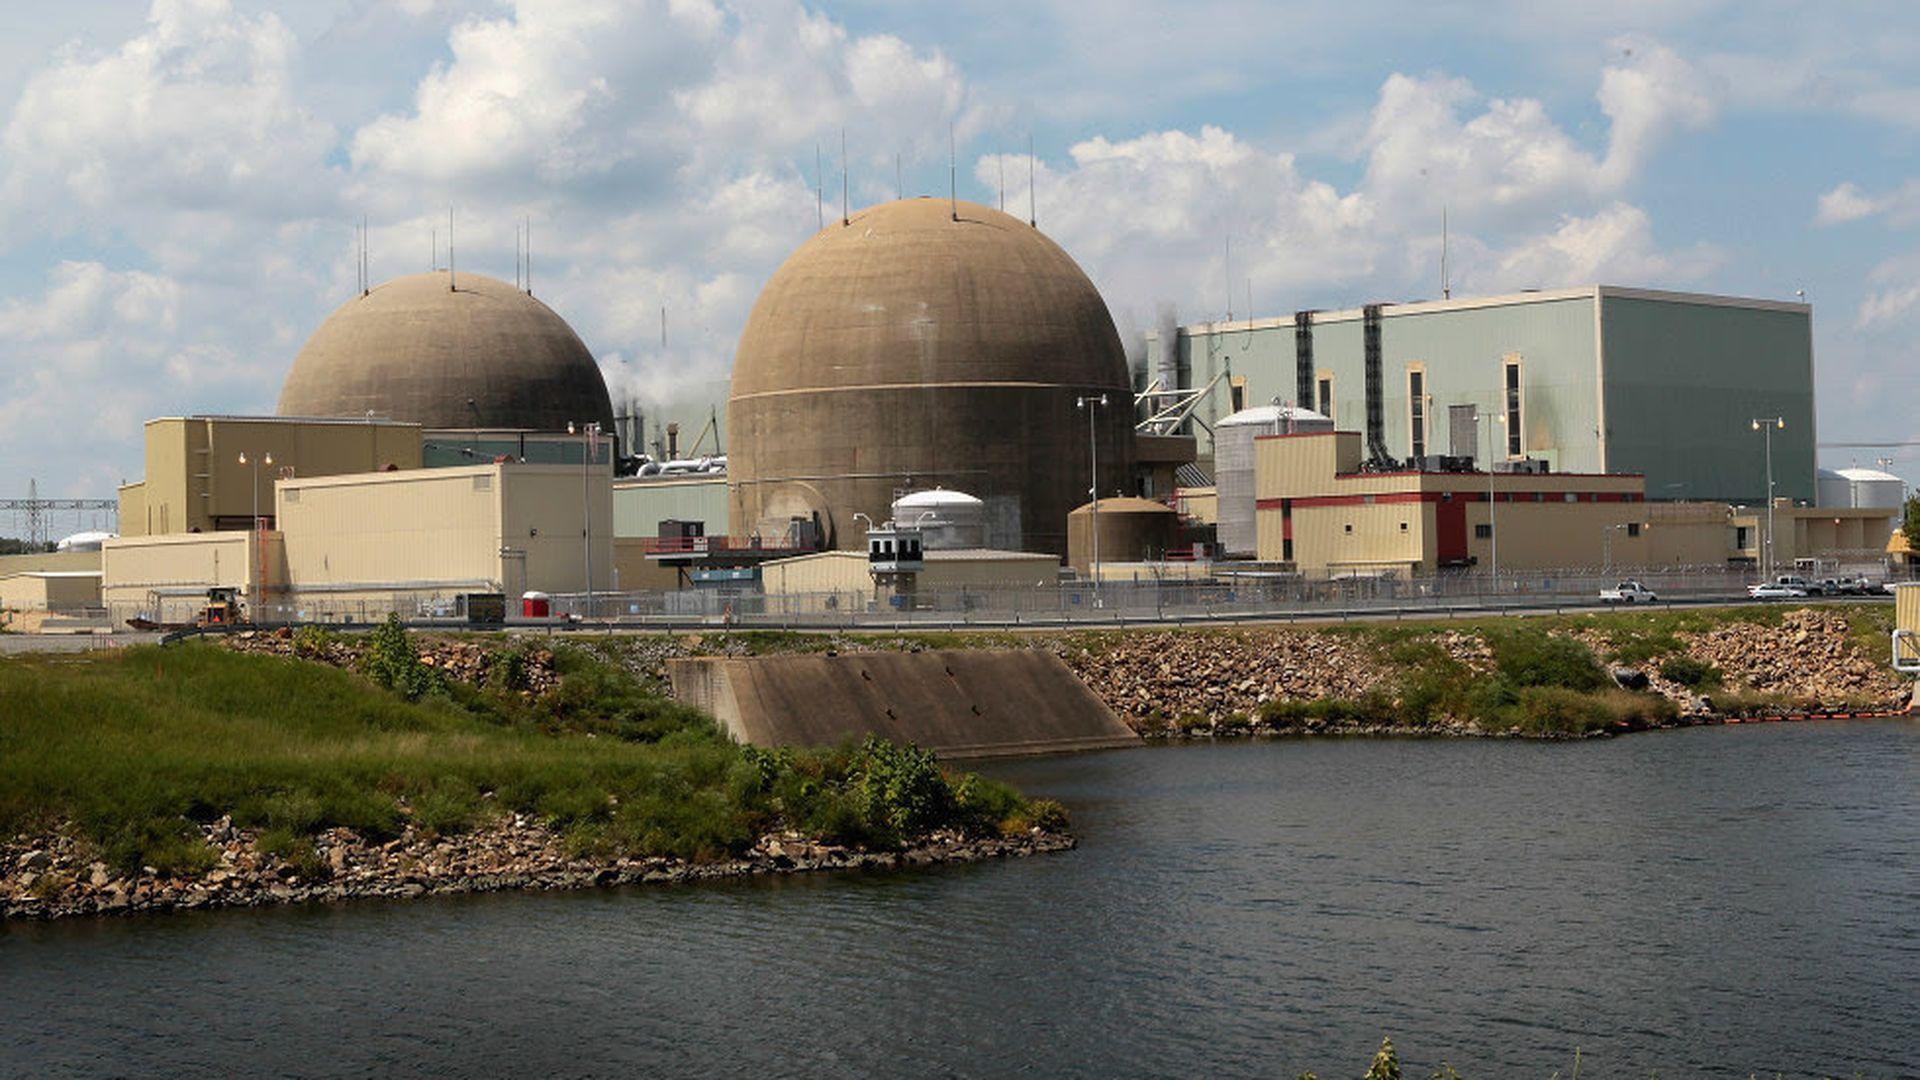 Dominion Energy is acquiring SCANA - Axios